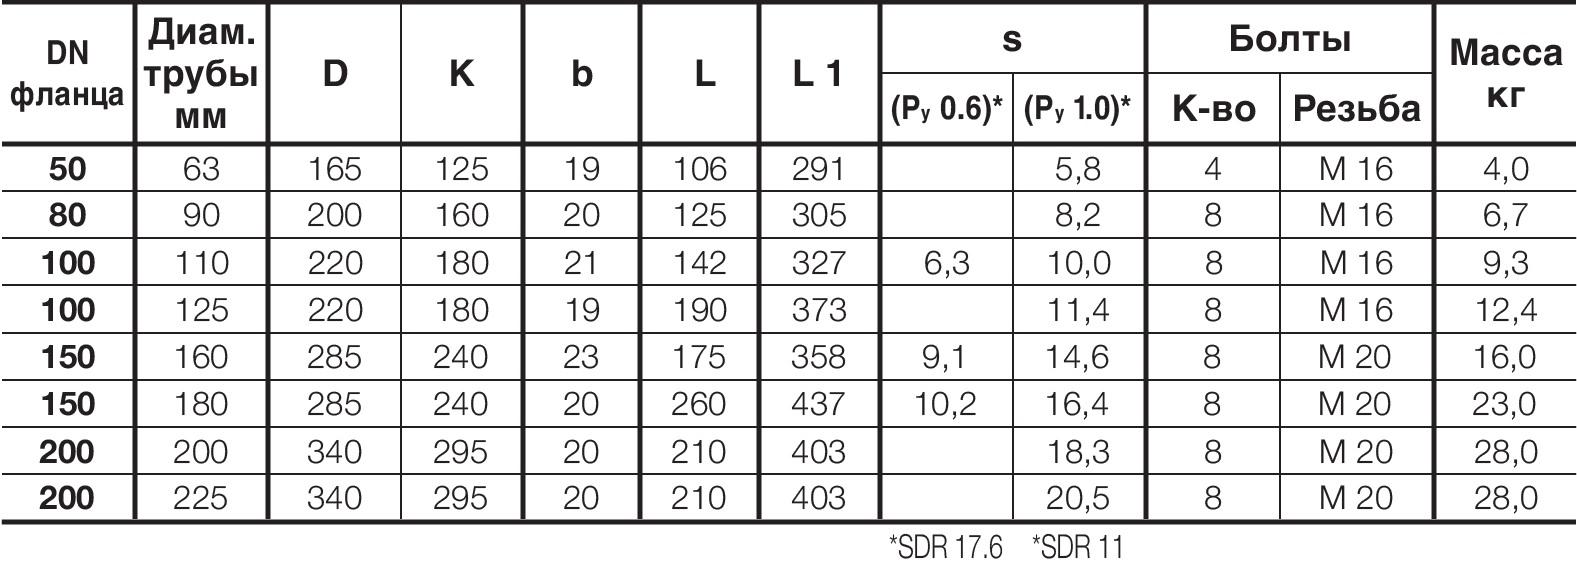 Таблица характеристик для Фланец Hawle 0310 с ПЭ патрубком для сварки